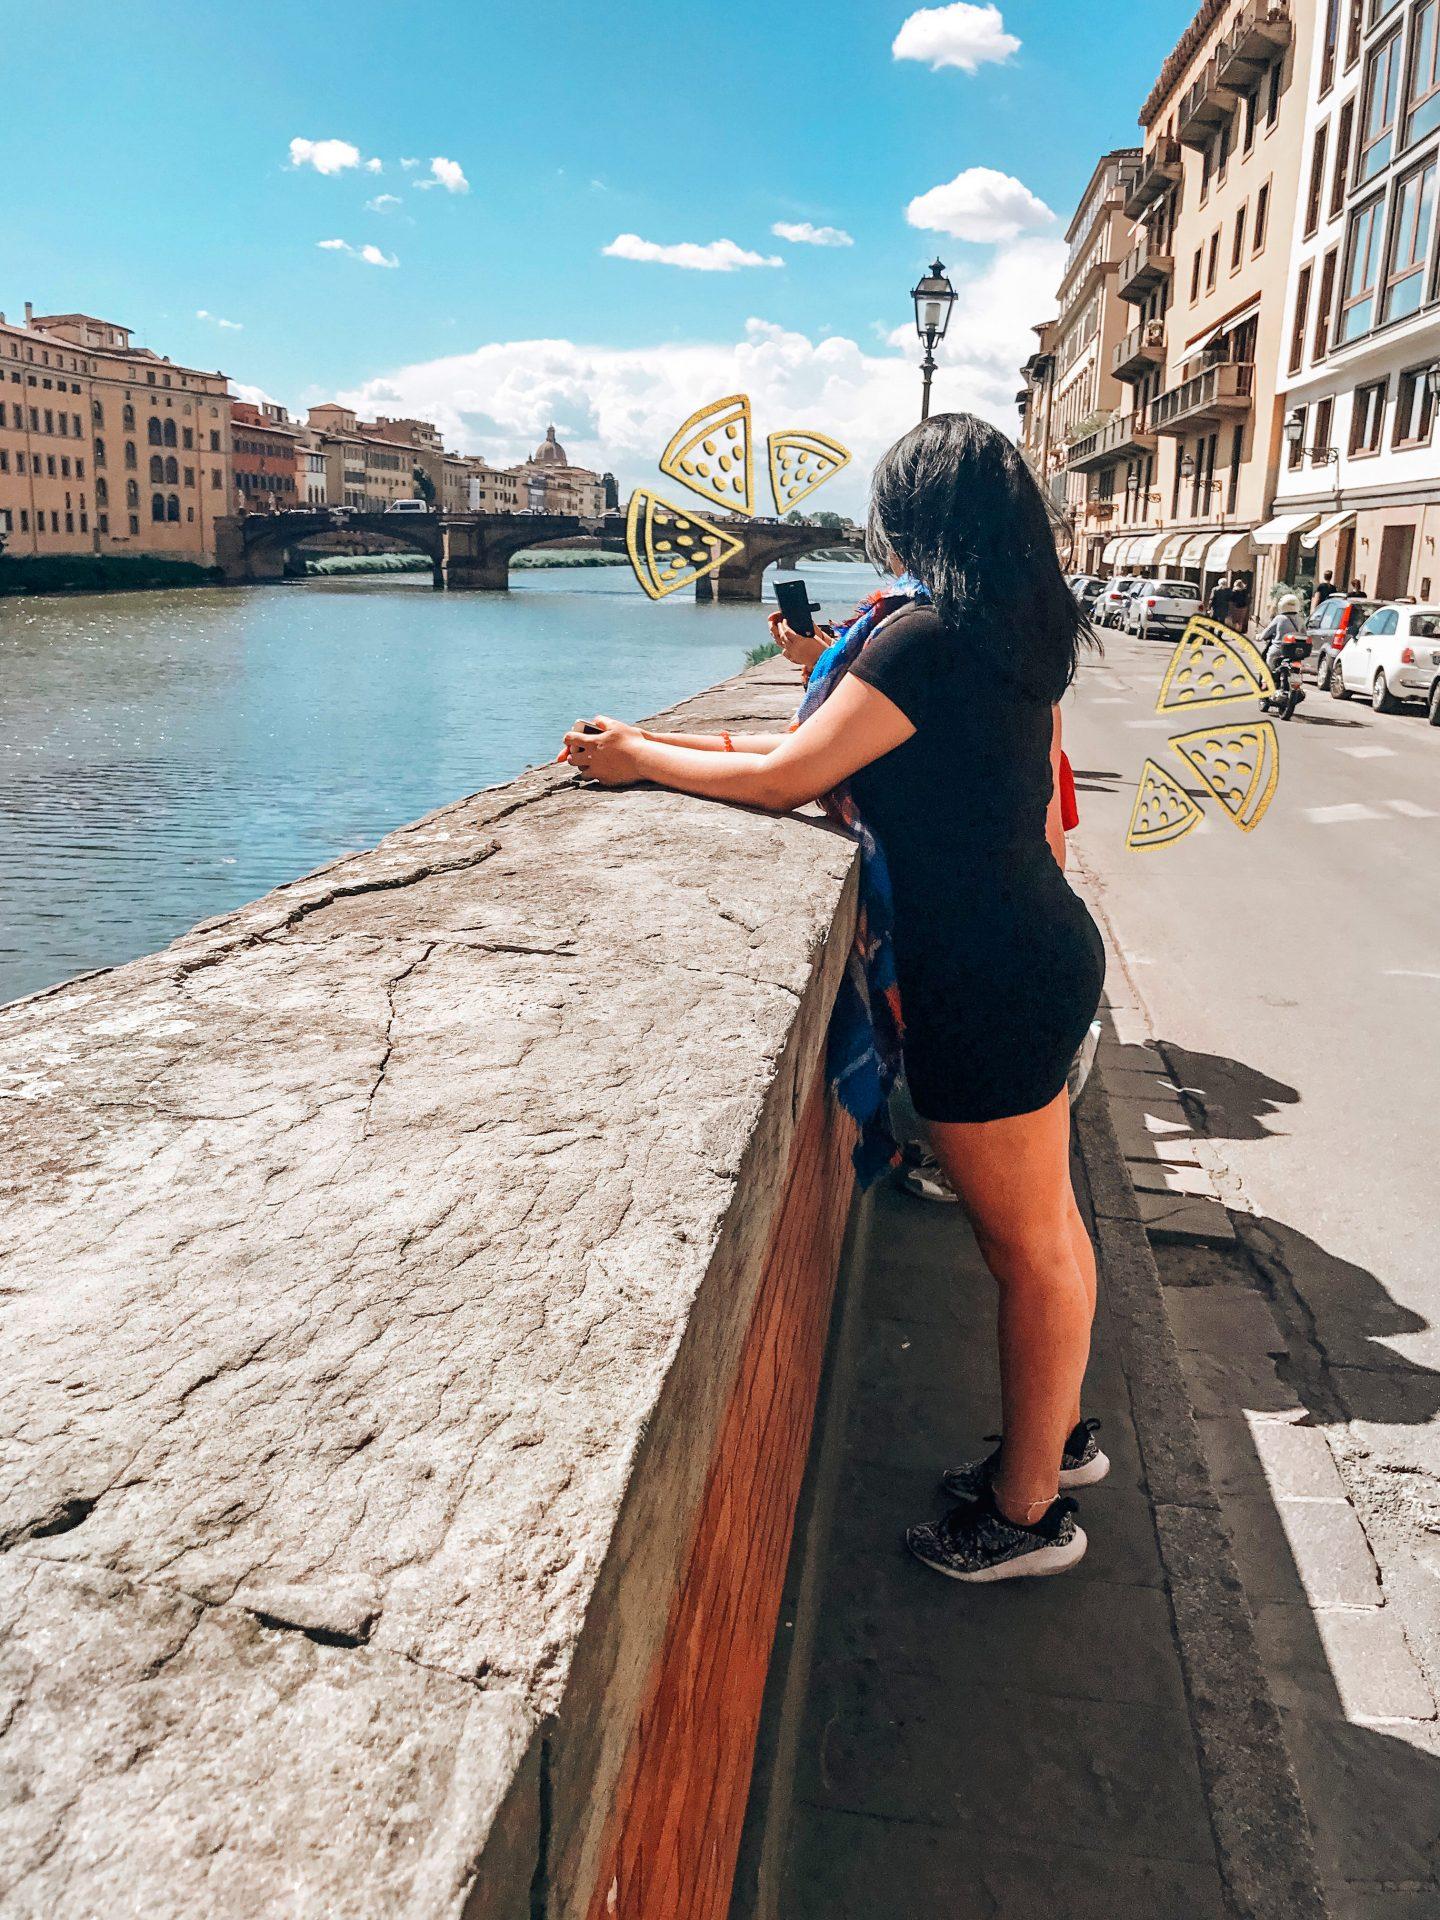 Tuscany Road Trip: Florence, Siena, Montepulciano, San Gimignano